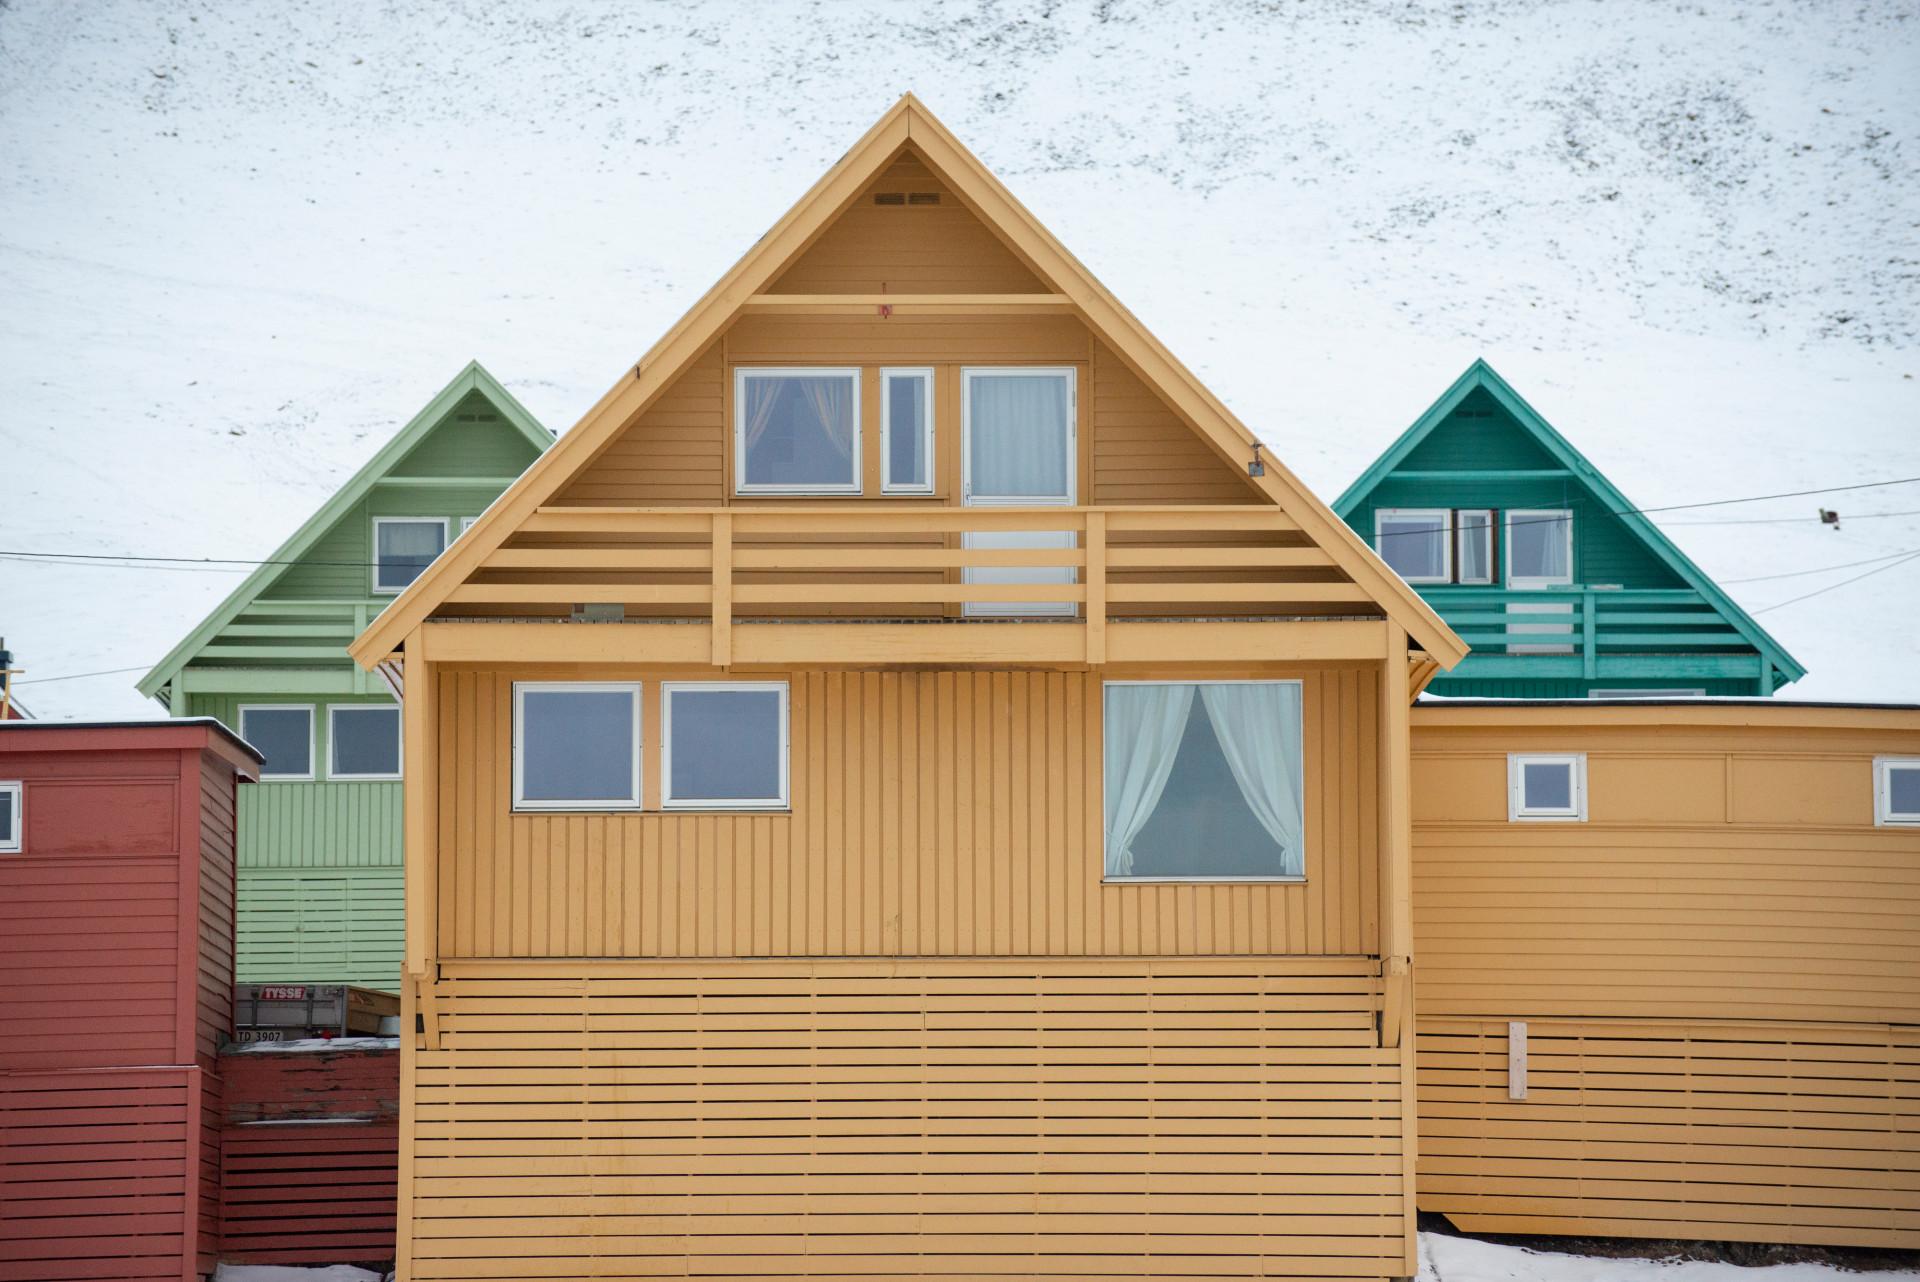 Longyearbyen, Svalbard, Norway. Photo: Nordiska museet